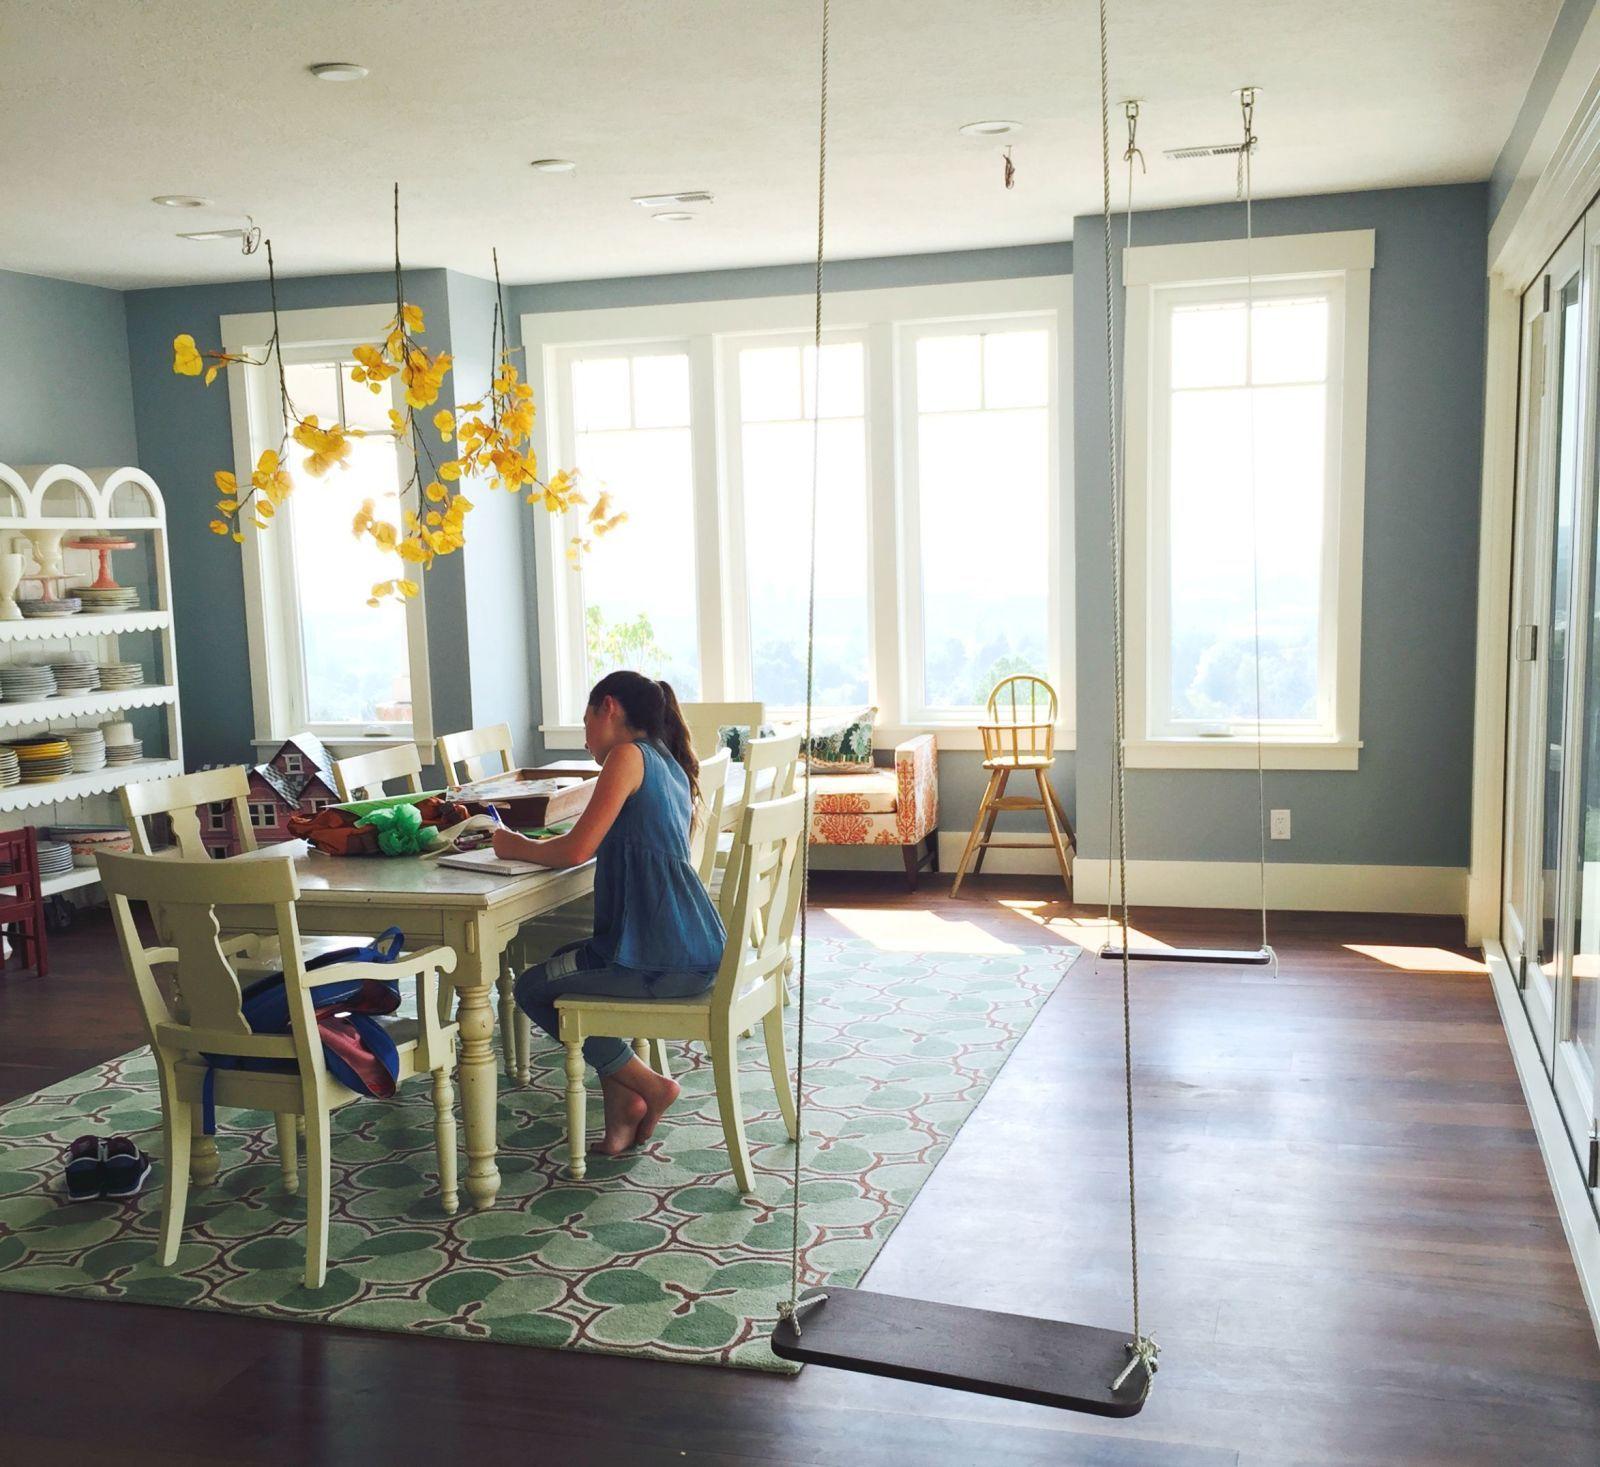 How a Plane Crash Survivor and Her Family Created Their Dream Home ...